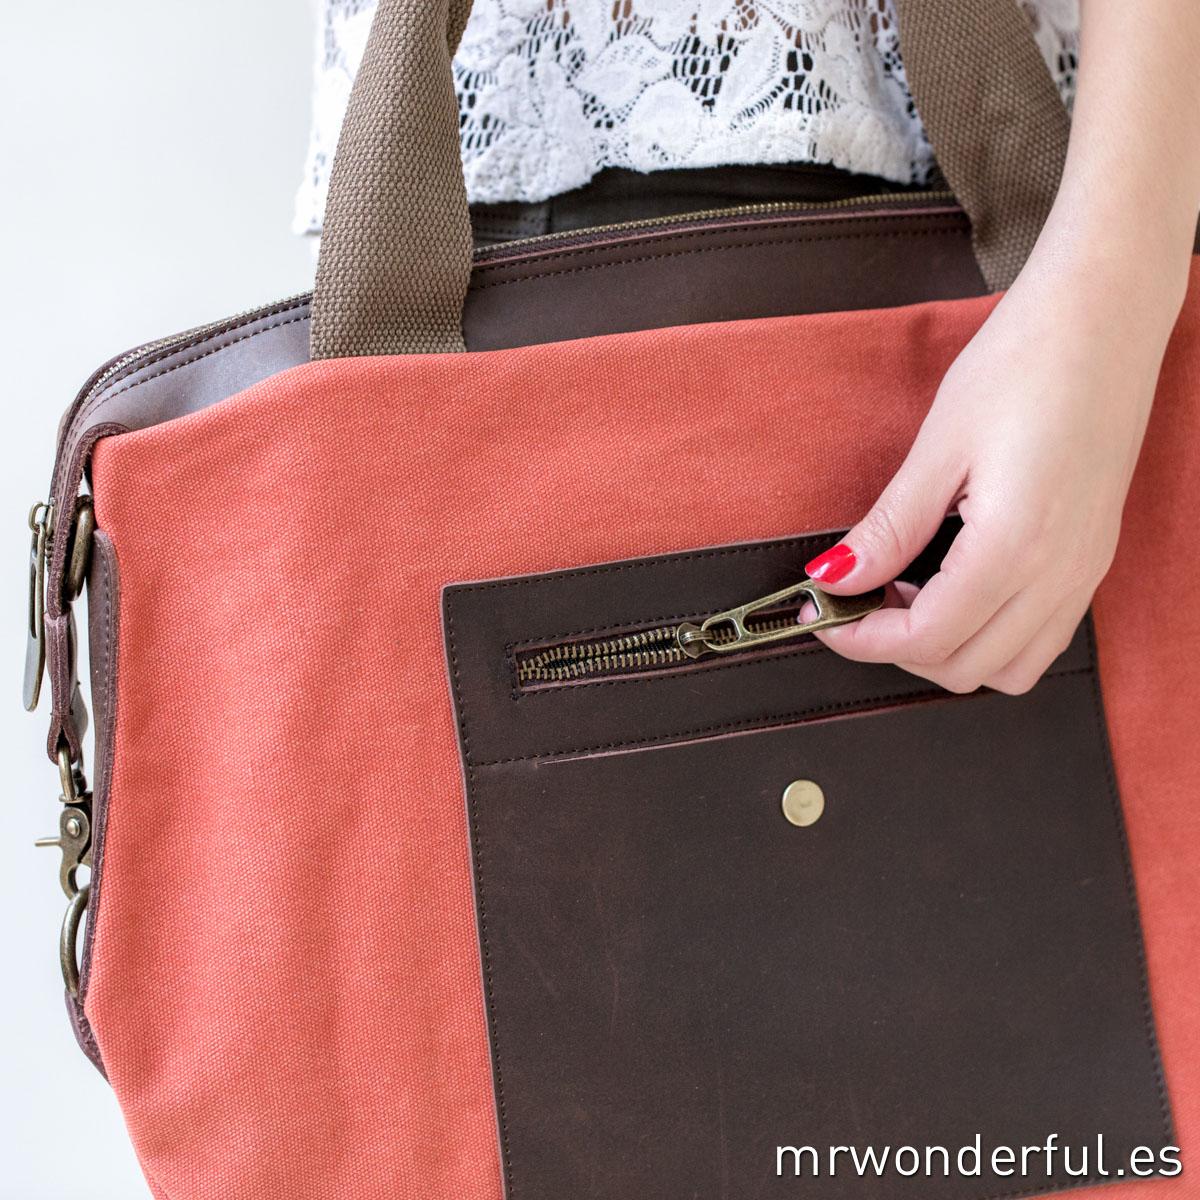 mrwonderful_bags_W2096-Corail-13-Editar